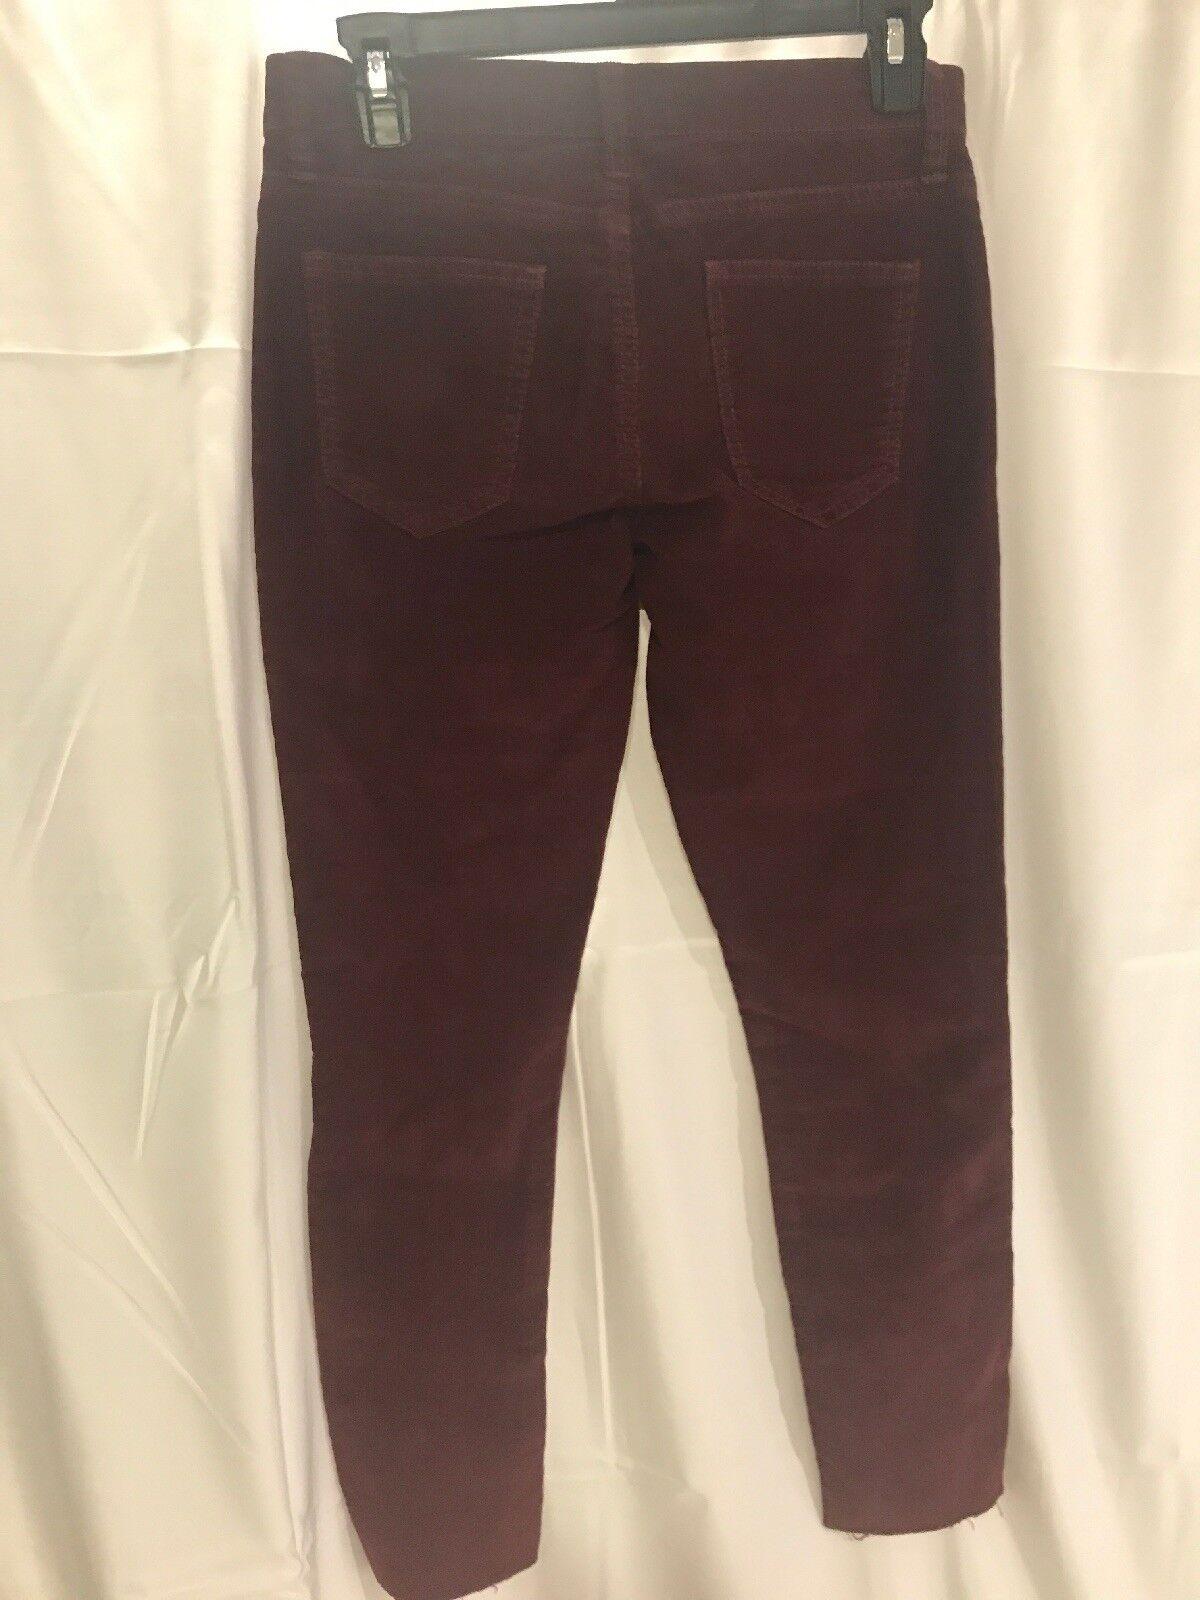 Corriente Elliott nuevo nuevo nuevo con etiquetas  208 la Skinny Jeans Hasta El Tobillo Stiletto Pana [tamaño 25]  F293 4f649c